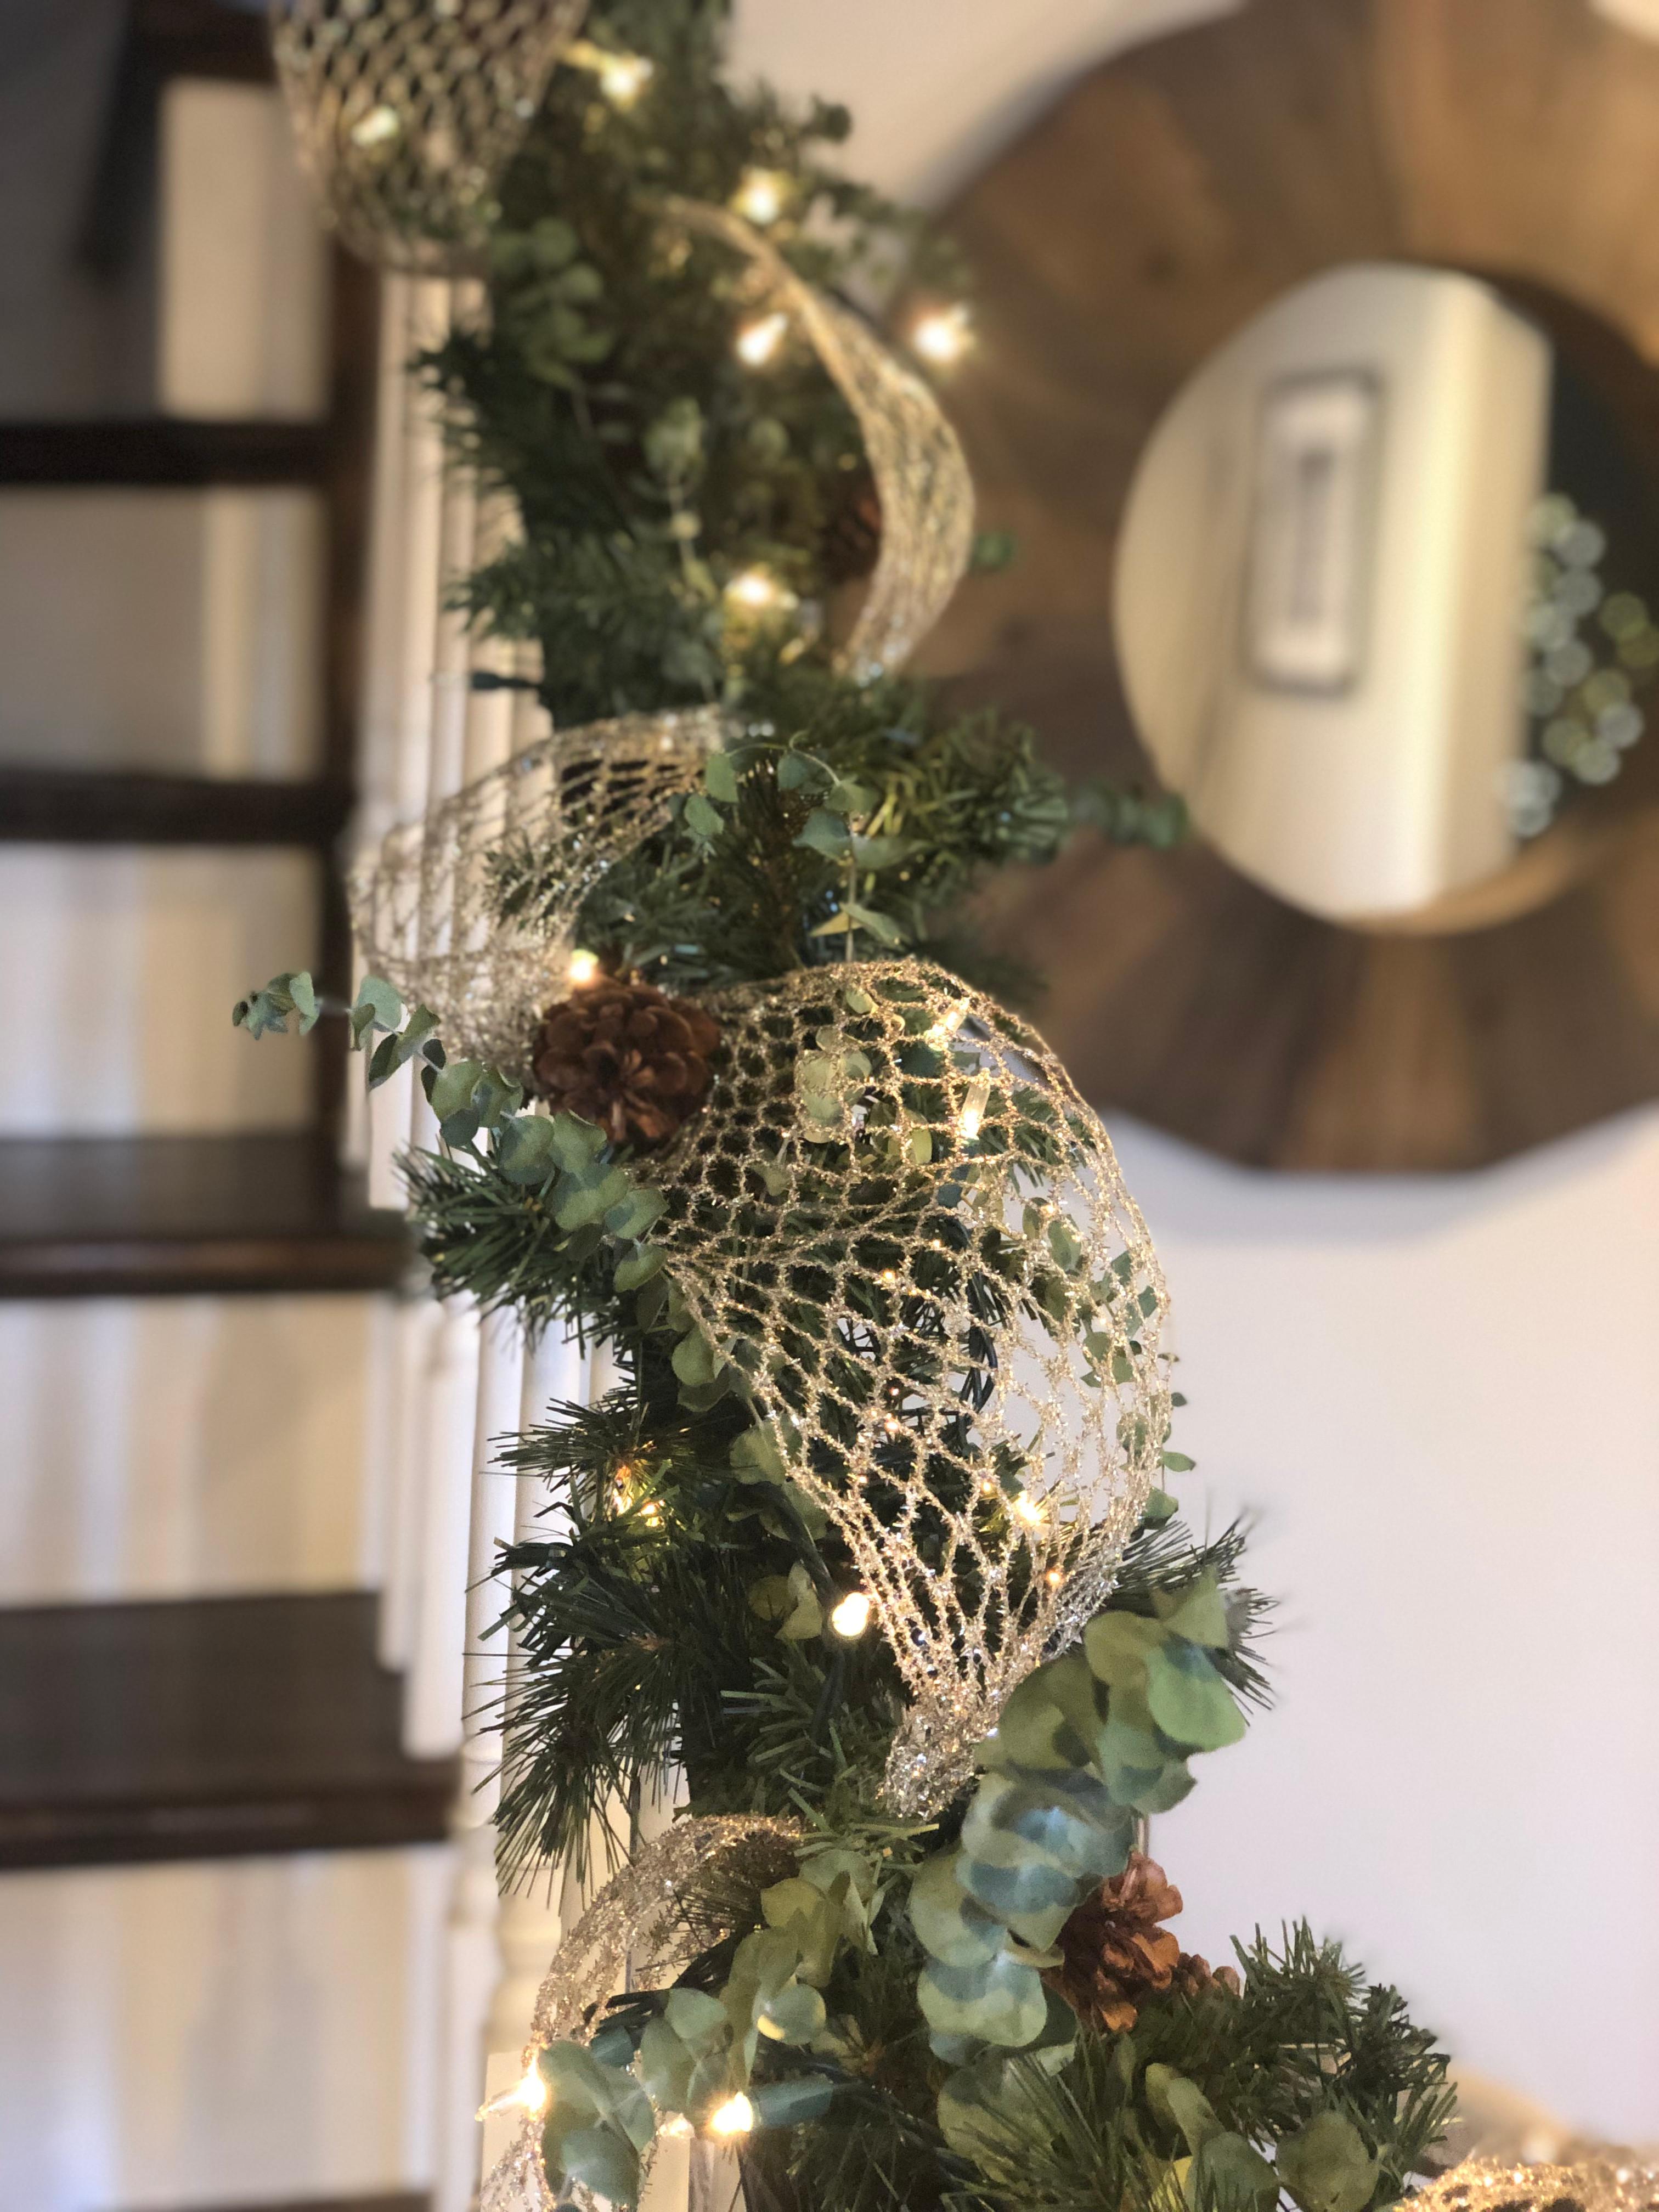 Interior Holiday Decorating